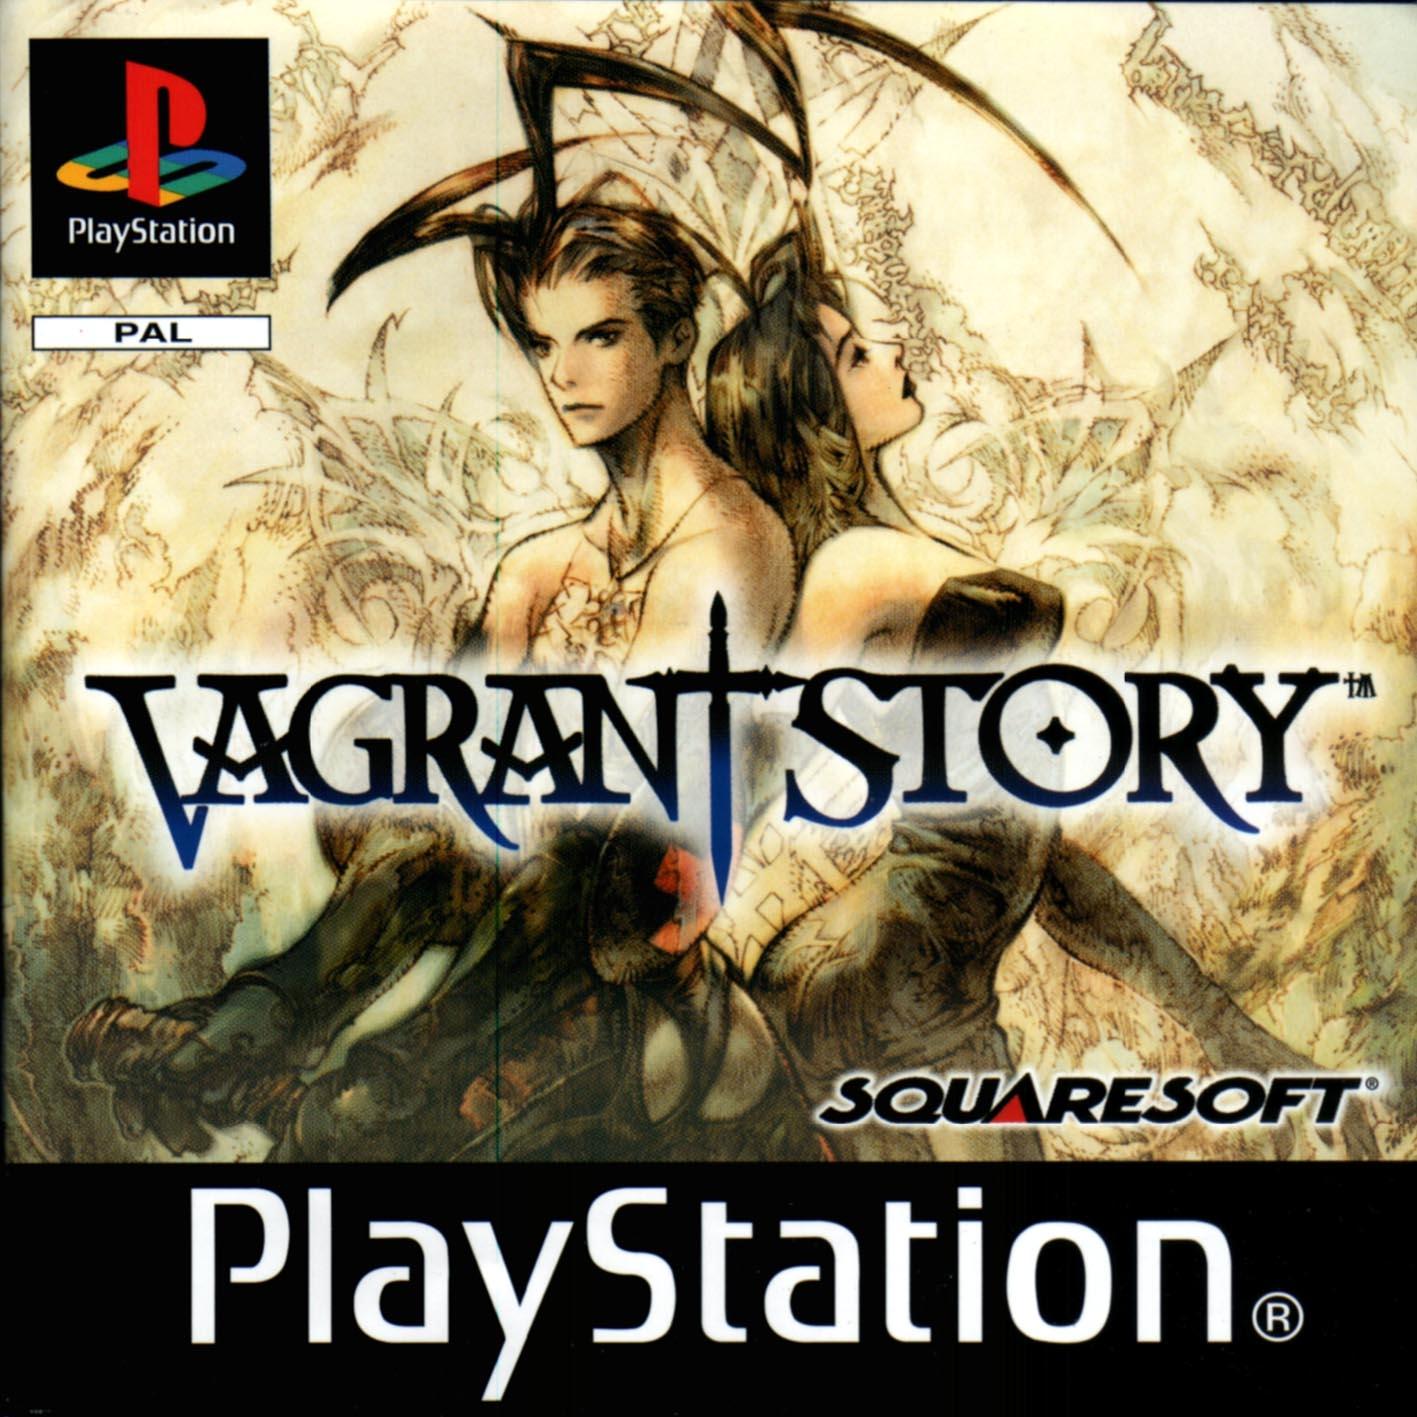 Vagrant Story 1417x1417